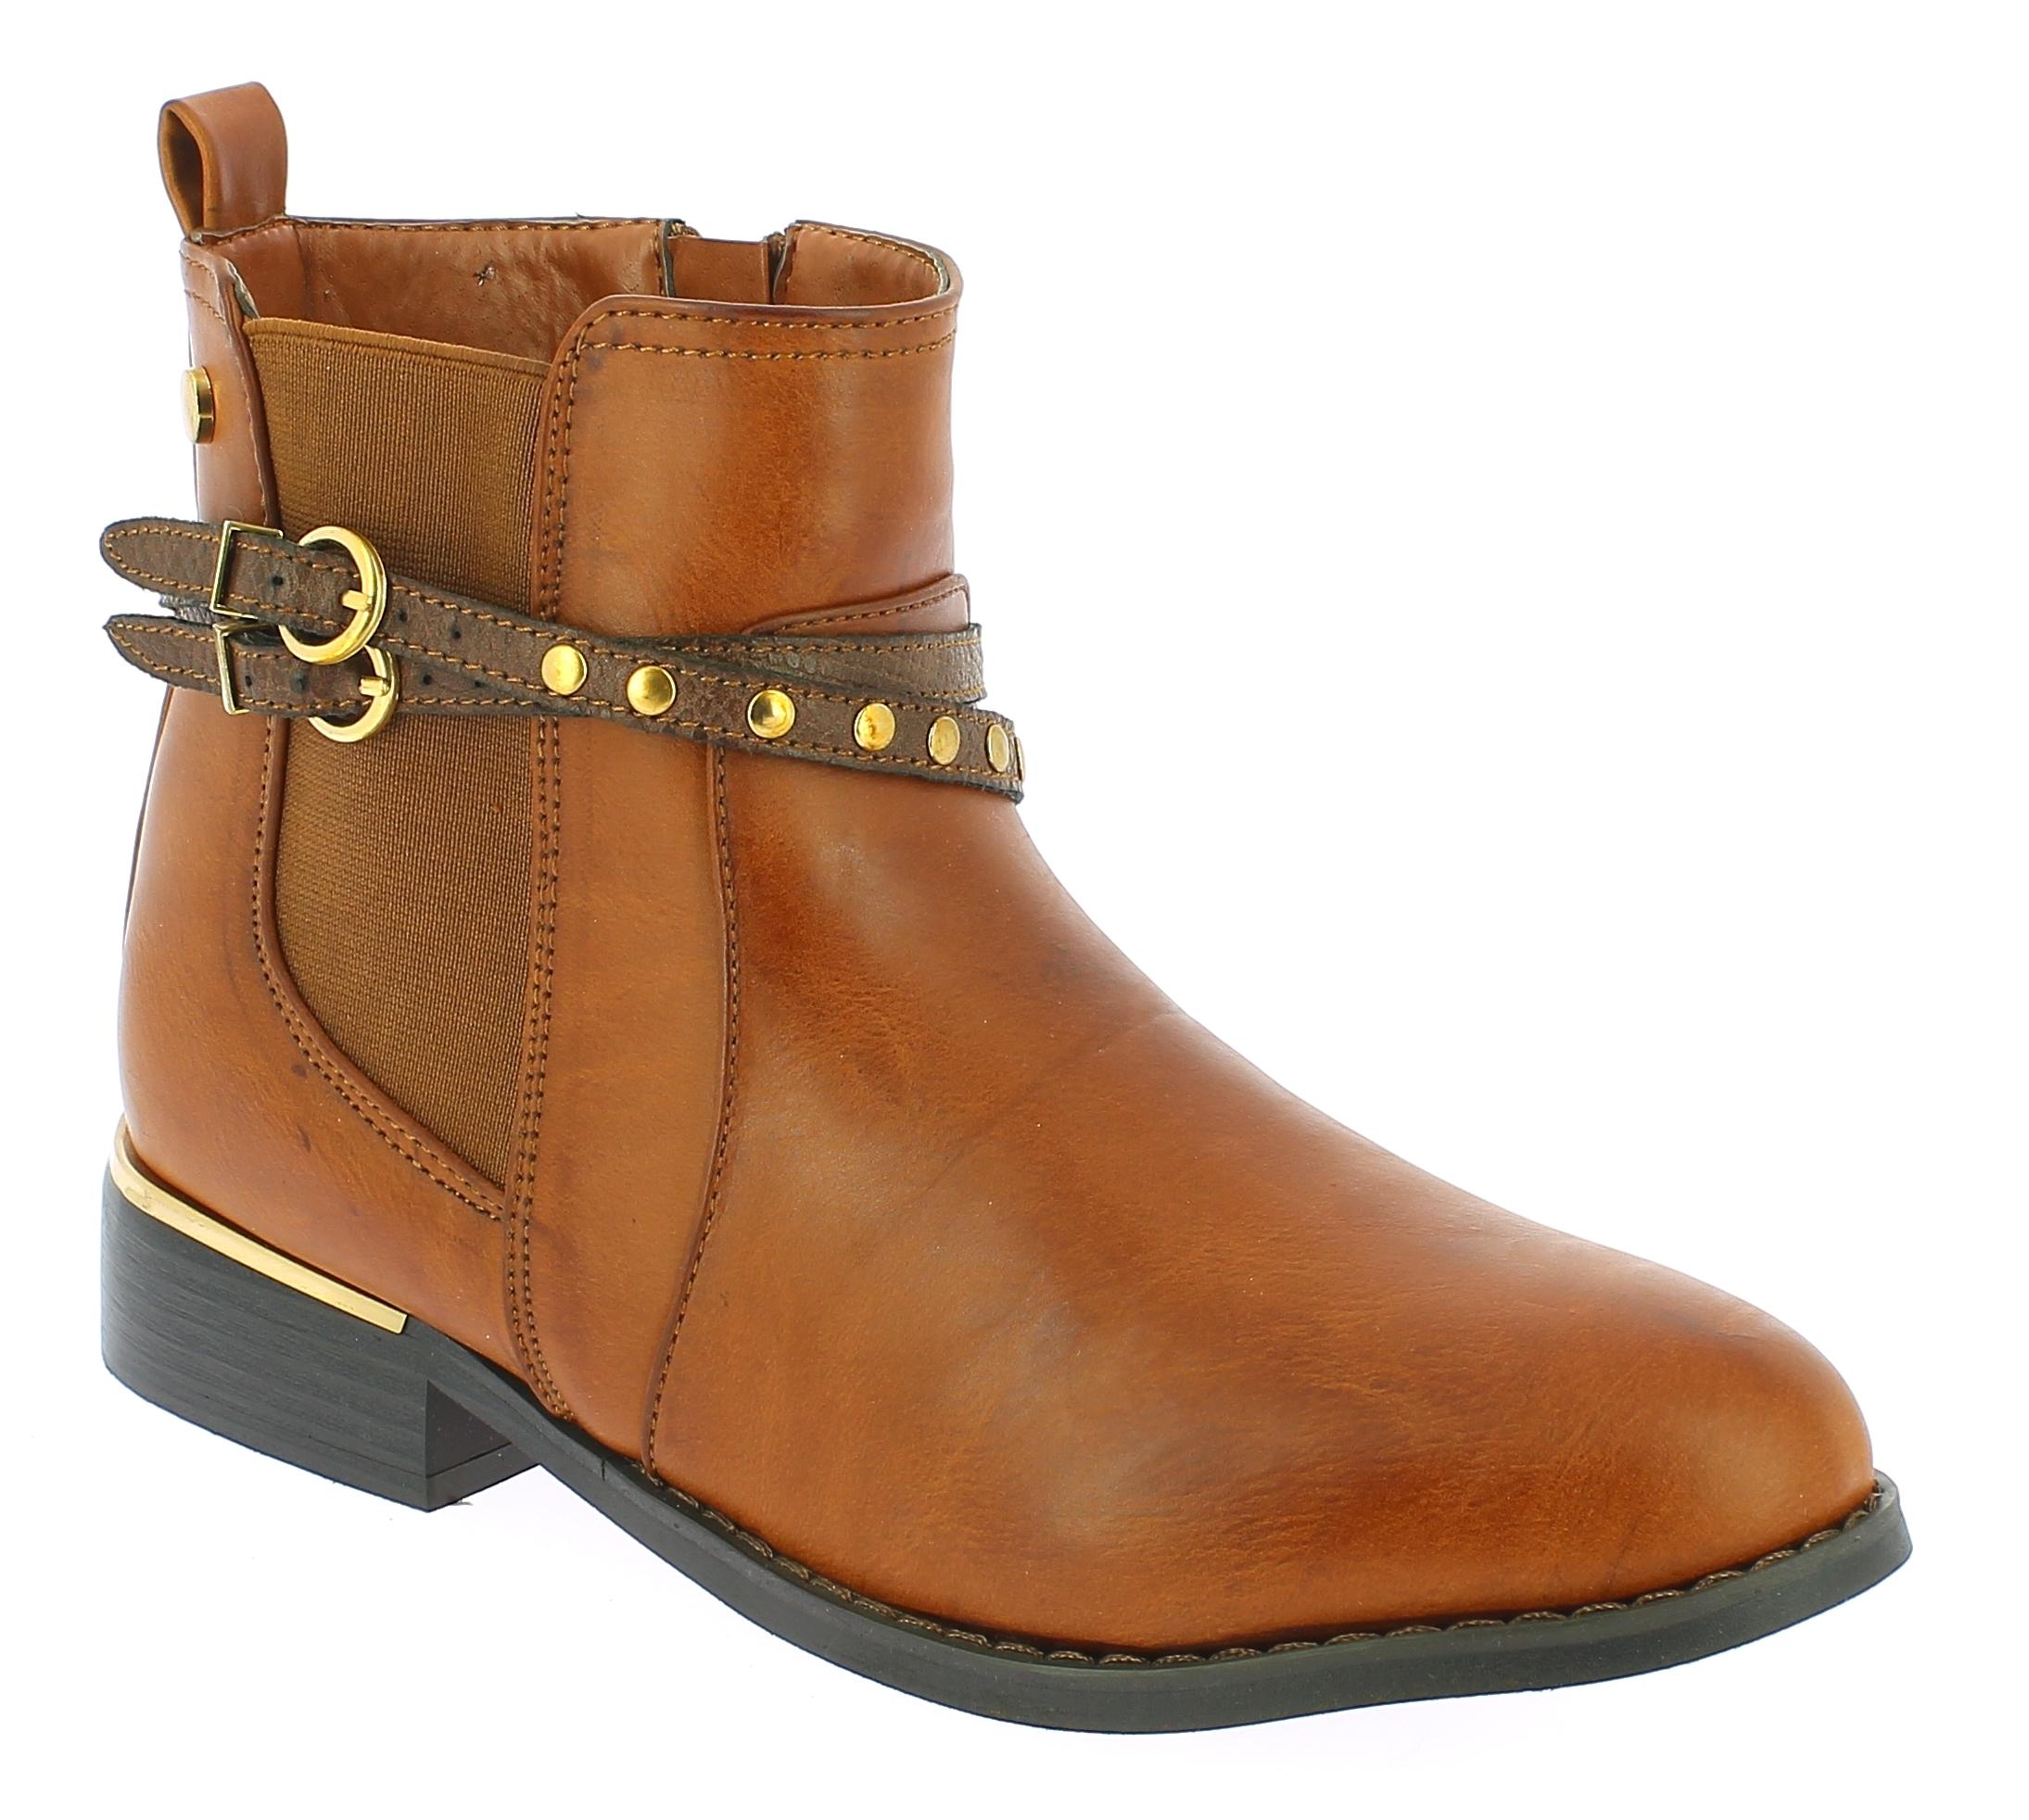 TOPWAY Γυναικείο Μποτάκι B750020 Καφέ - IqShoes - B750020 BROWN-brown-36/1/24/7 παπούτσια  γυναικεία μποτάκια